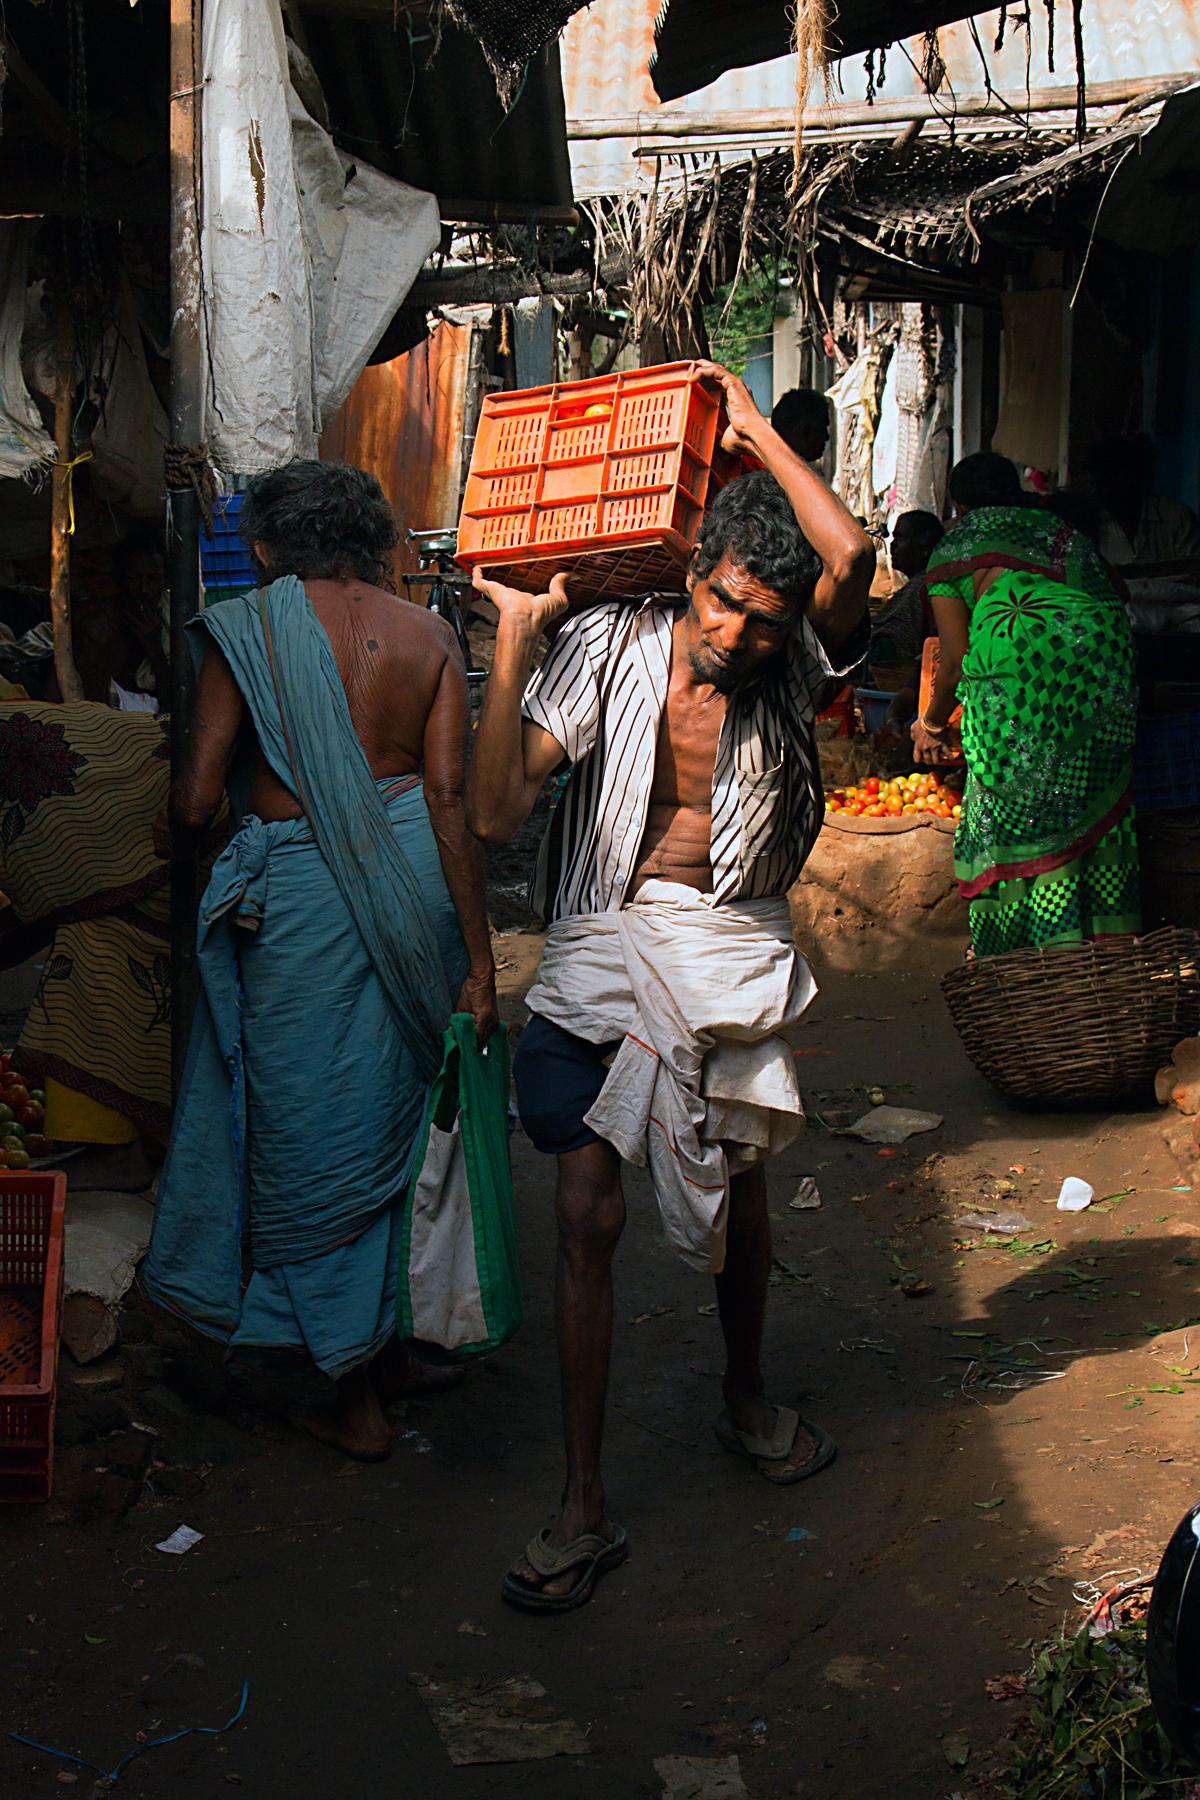 INDIEN Kumily Thekkady Kumarakom Kerala Menschen Tempel FINEST-onTour 7913.jpg